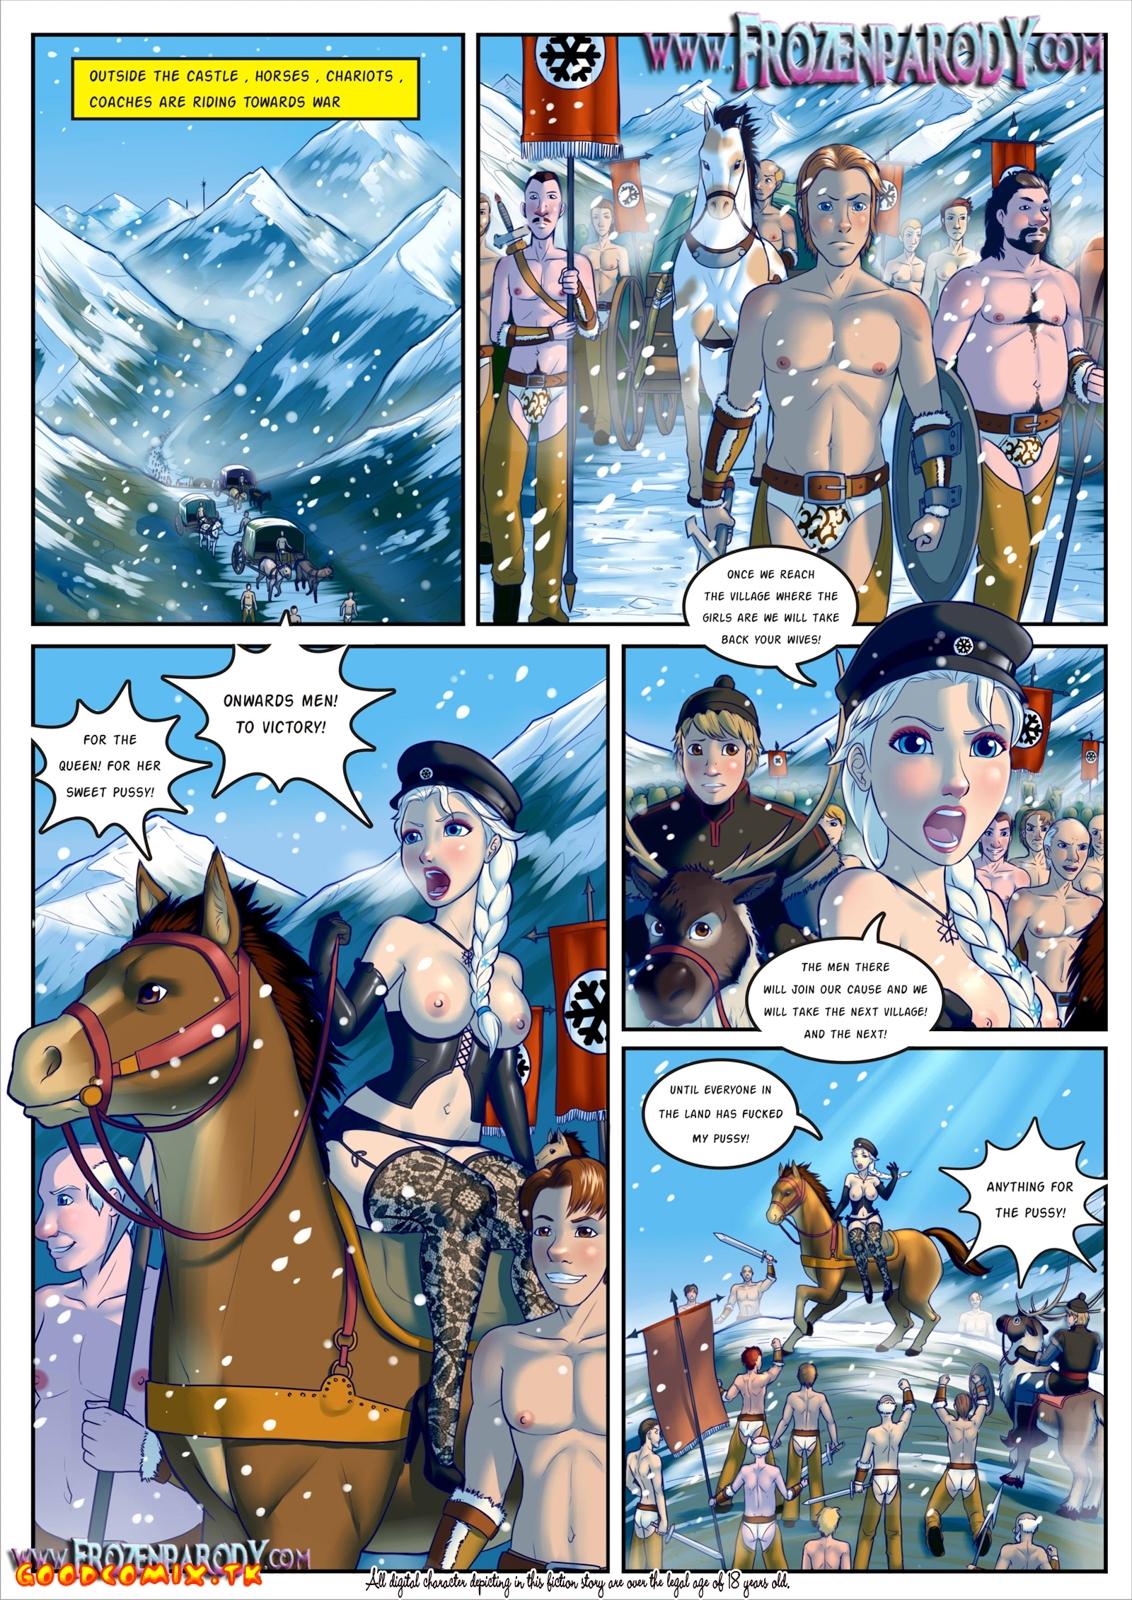 Goodcomix.tk Frozen - [Grimphantom][FrozenParody] - Frozen Parody - Part 2 Anna